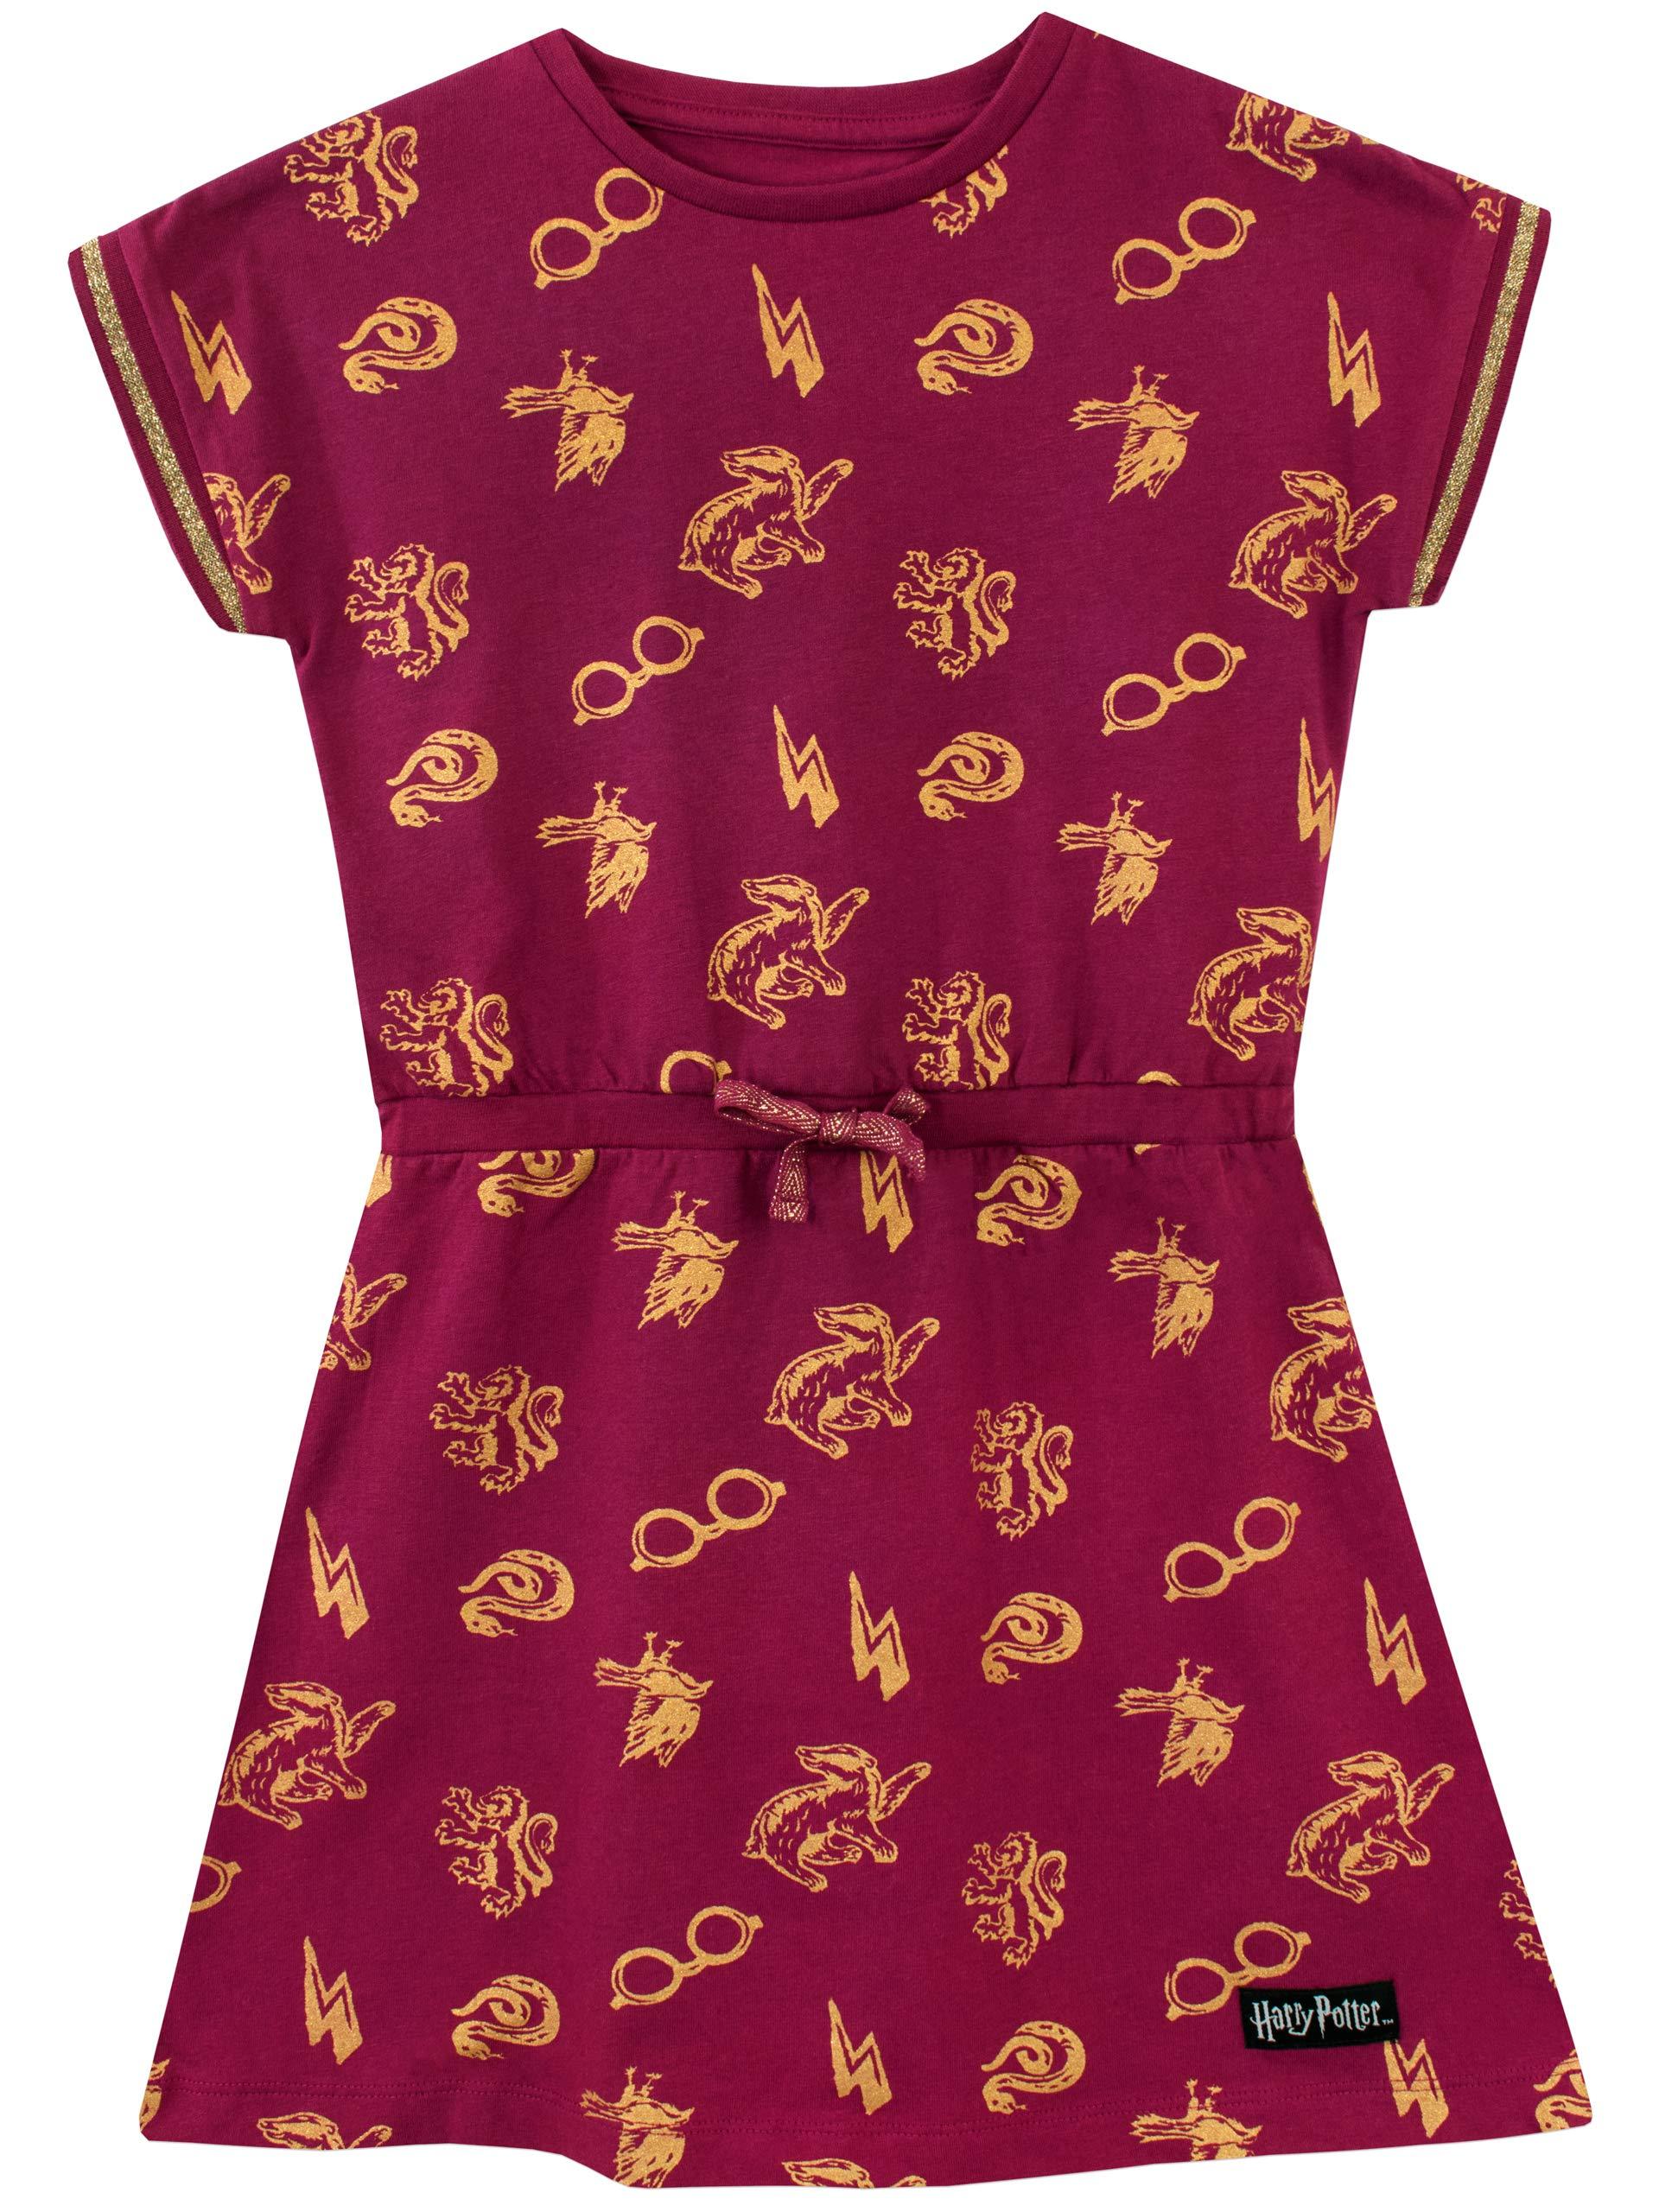 Harry Potter Girls' Hogwarts Dress Size 10 Red